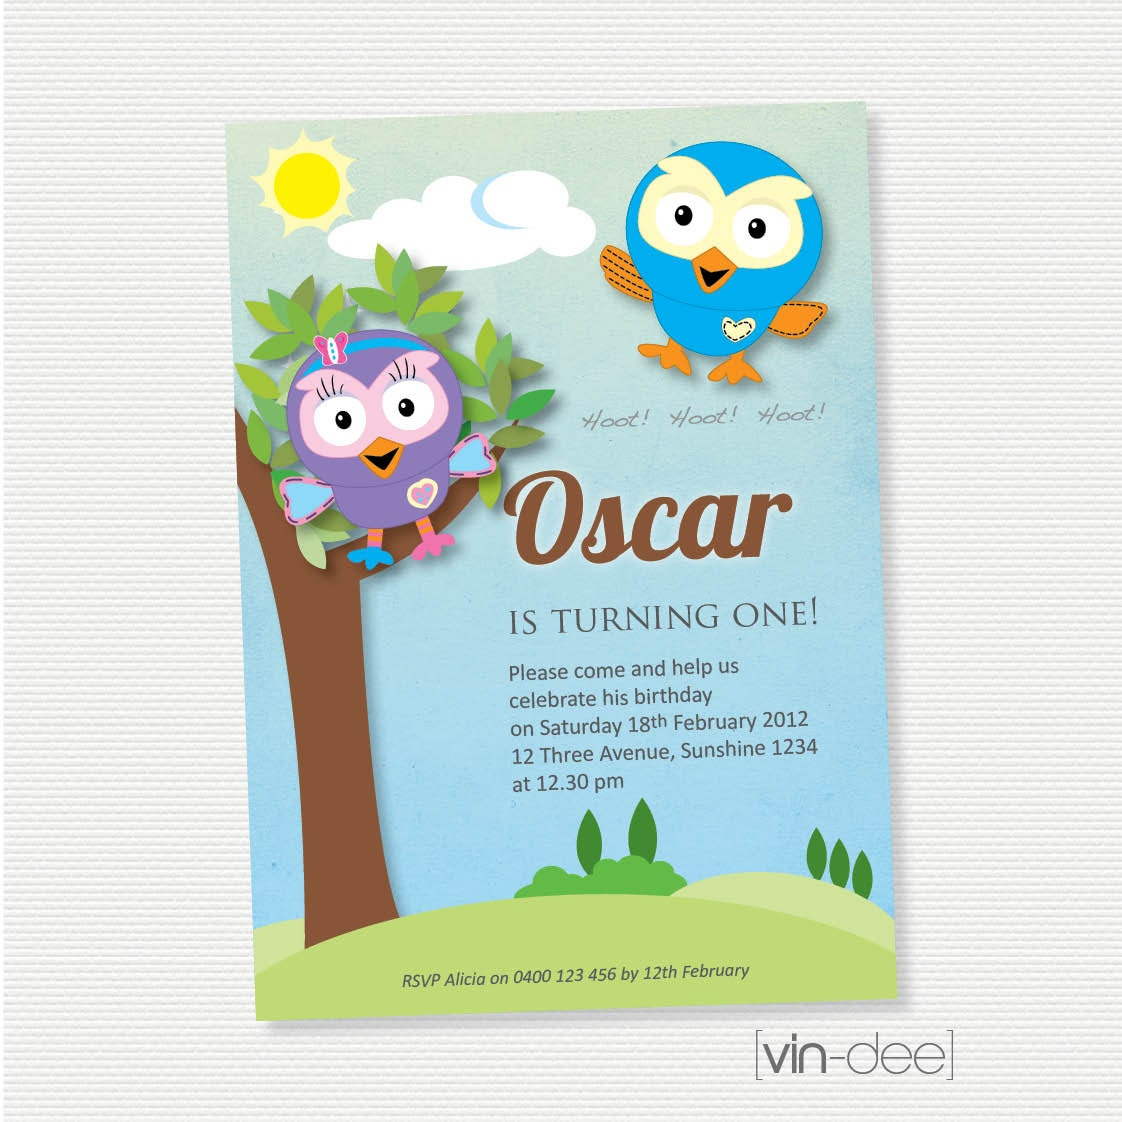 Airplane Birthday Invitation Diy Printable By Vindee On Etsy: Hoot And Hootabelle Birthday Invitation DIY Printable